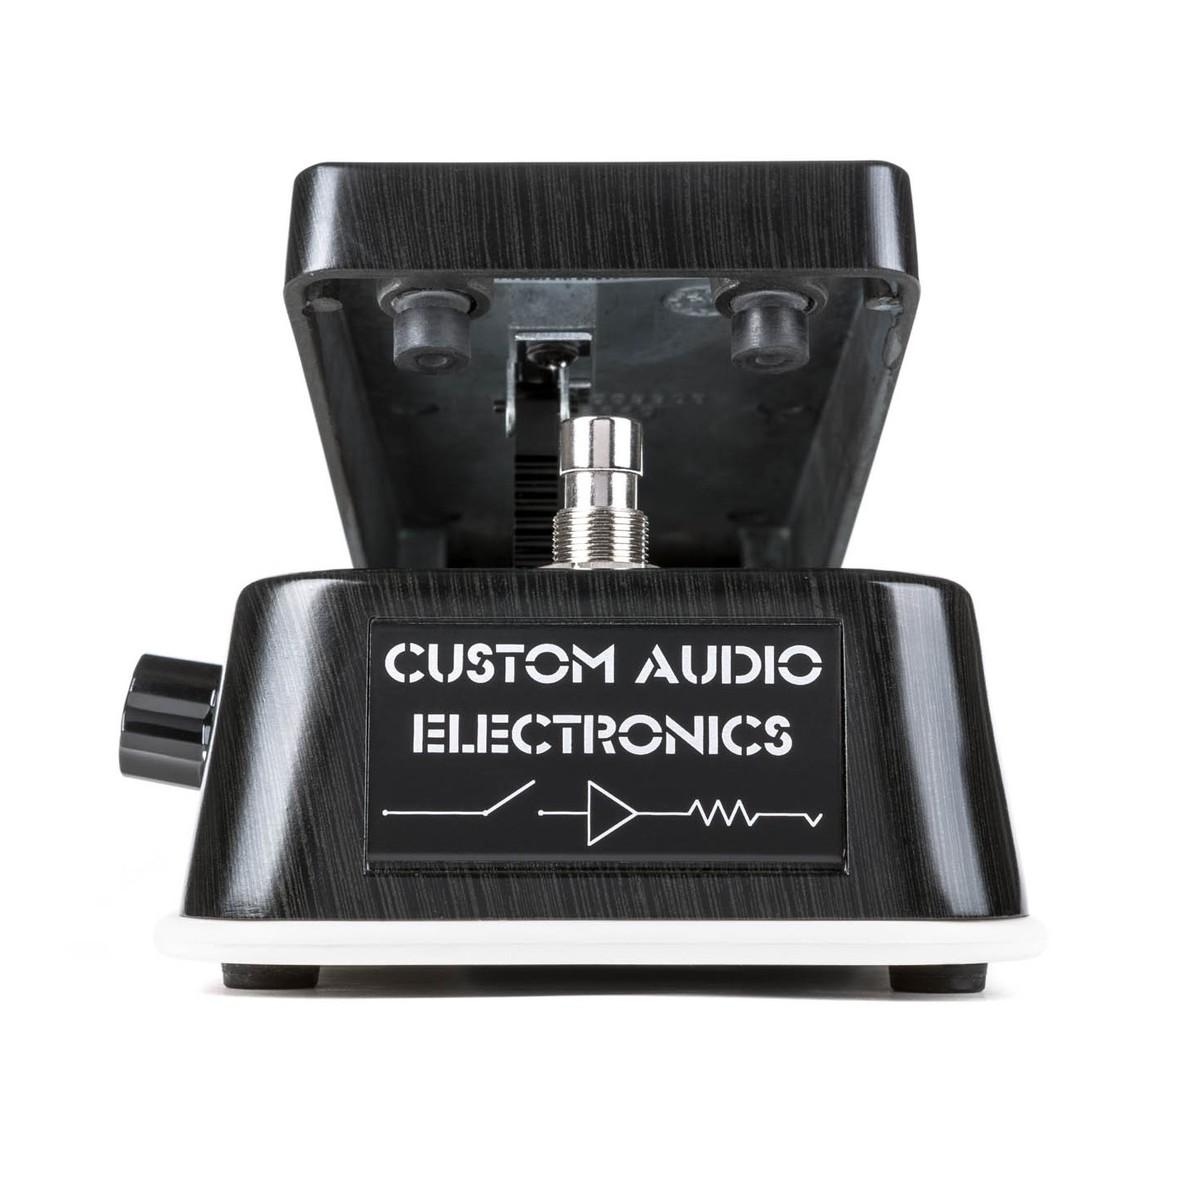 Schema Elettrico Wah Wah : Mxr mc custom audio electronics wah pedal a gear music